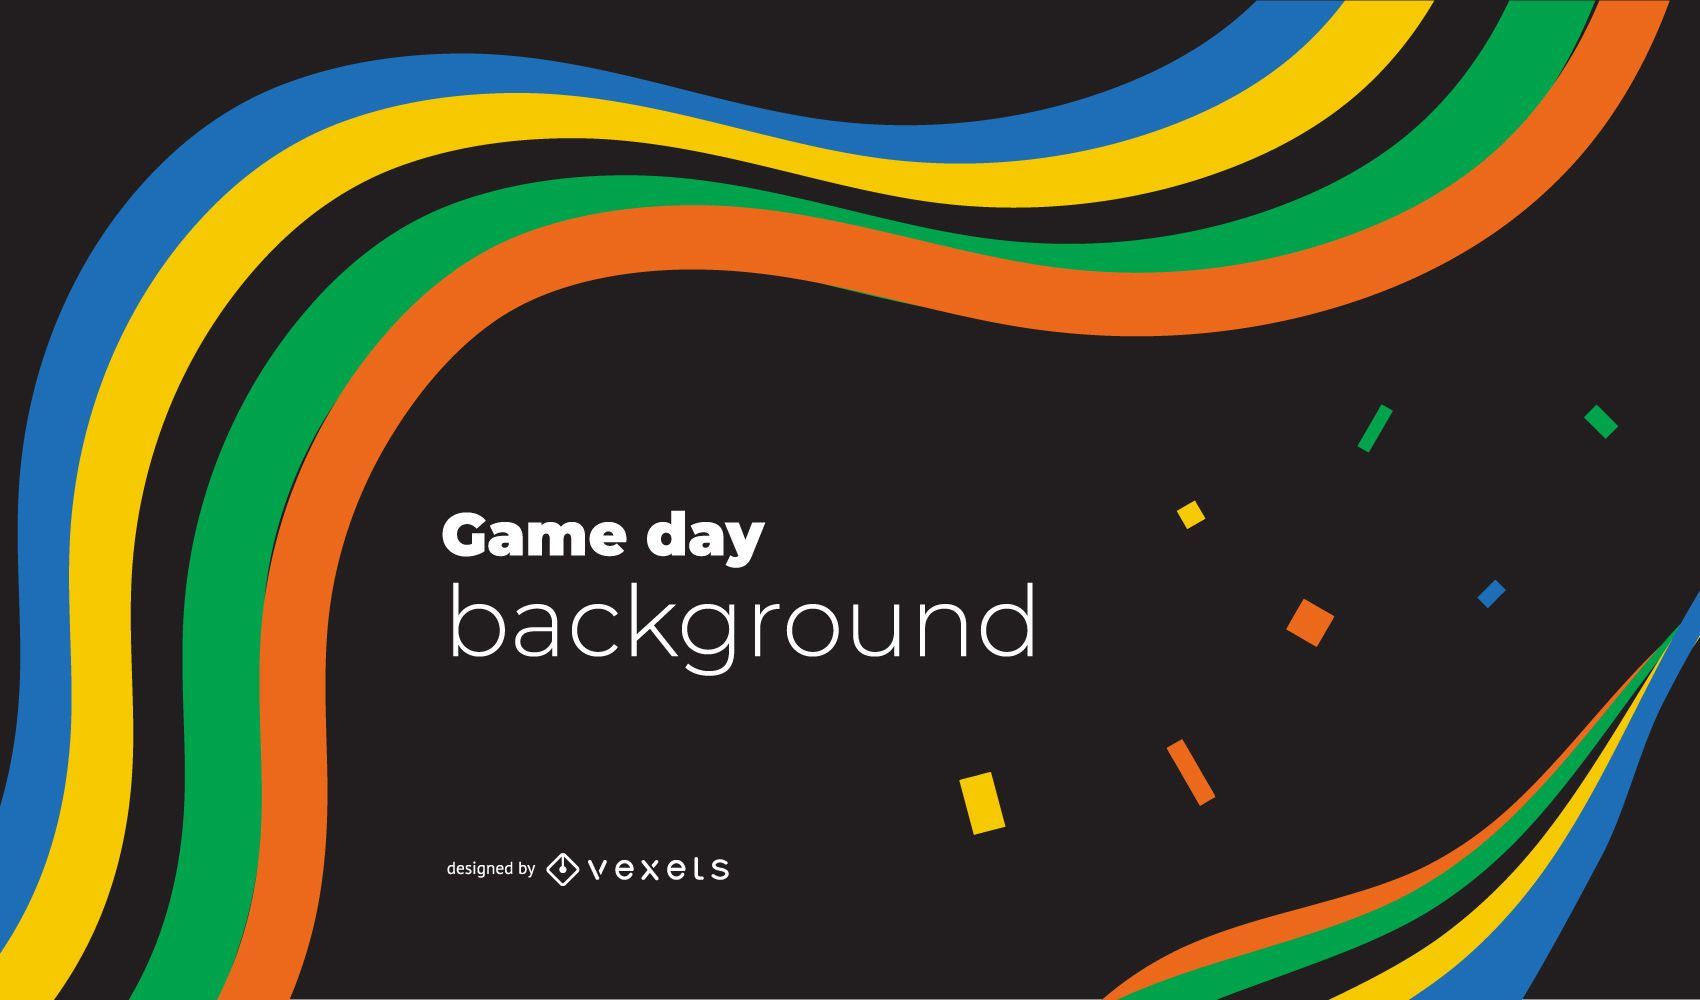 Tokyo 2020 Olympics Background Design